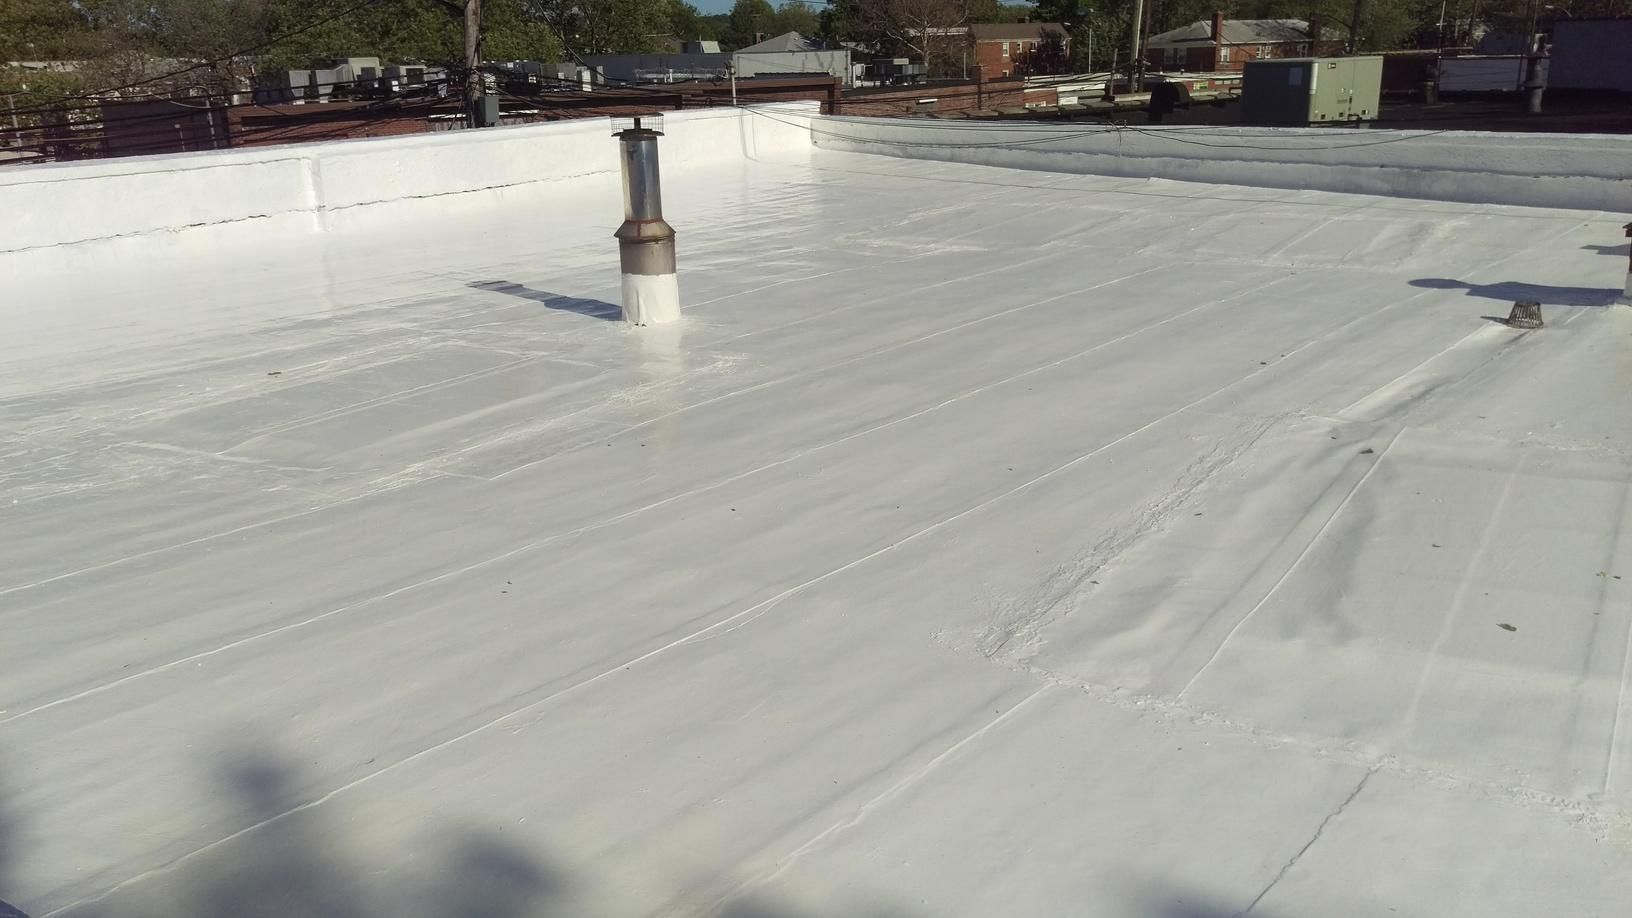 Flat Roof Repair Brooklyn Ny In 2020 Flat Roof Repair Image House Flat Roof